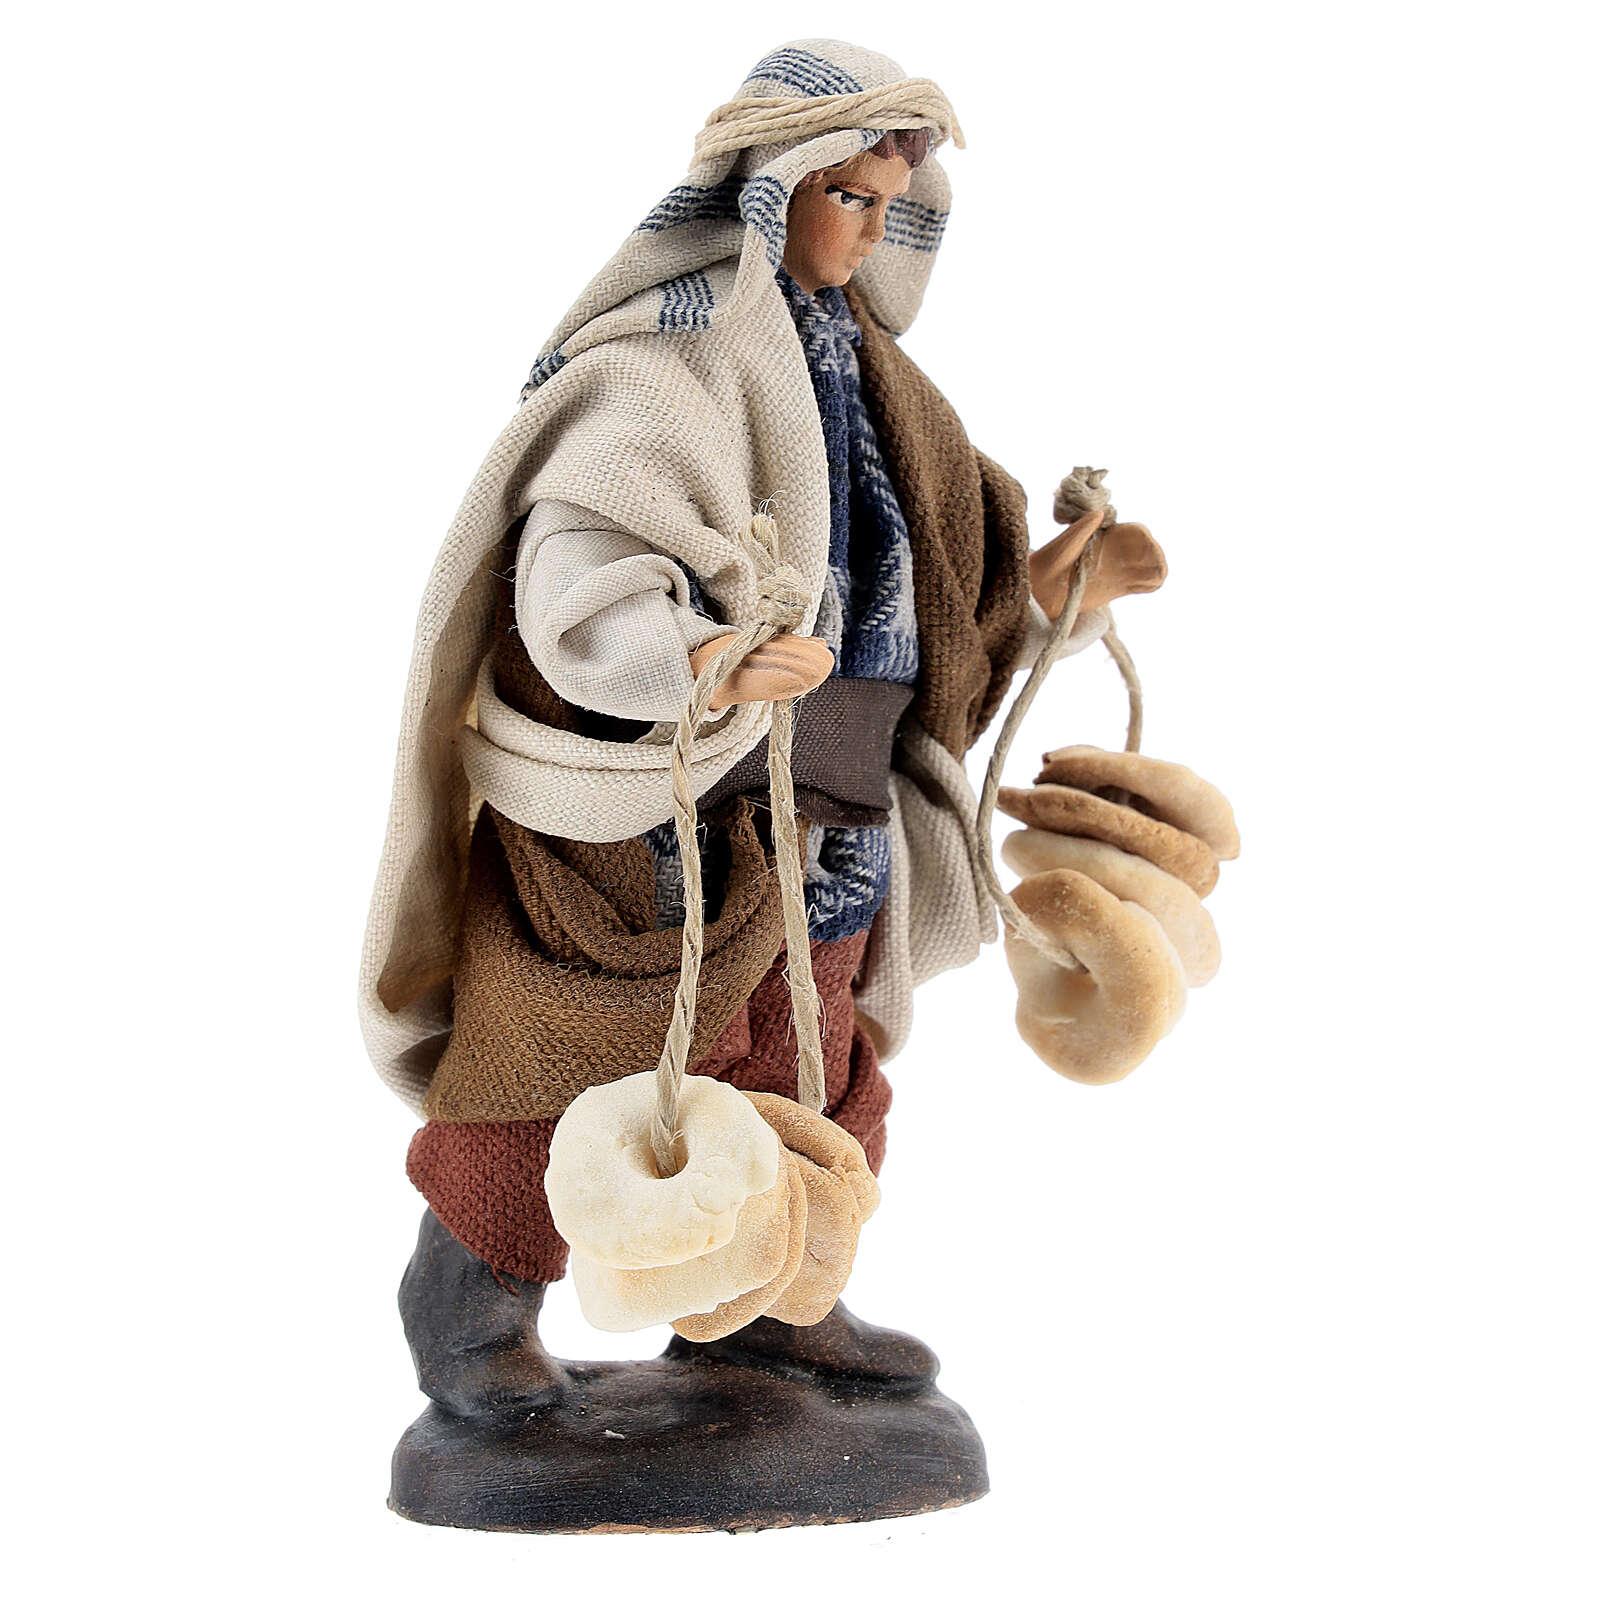 Statue man selling freselle bread, 12 cm Neapolitan nativity terracotta cloth 4